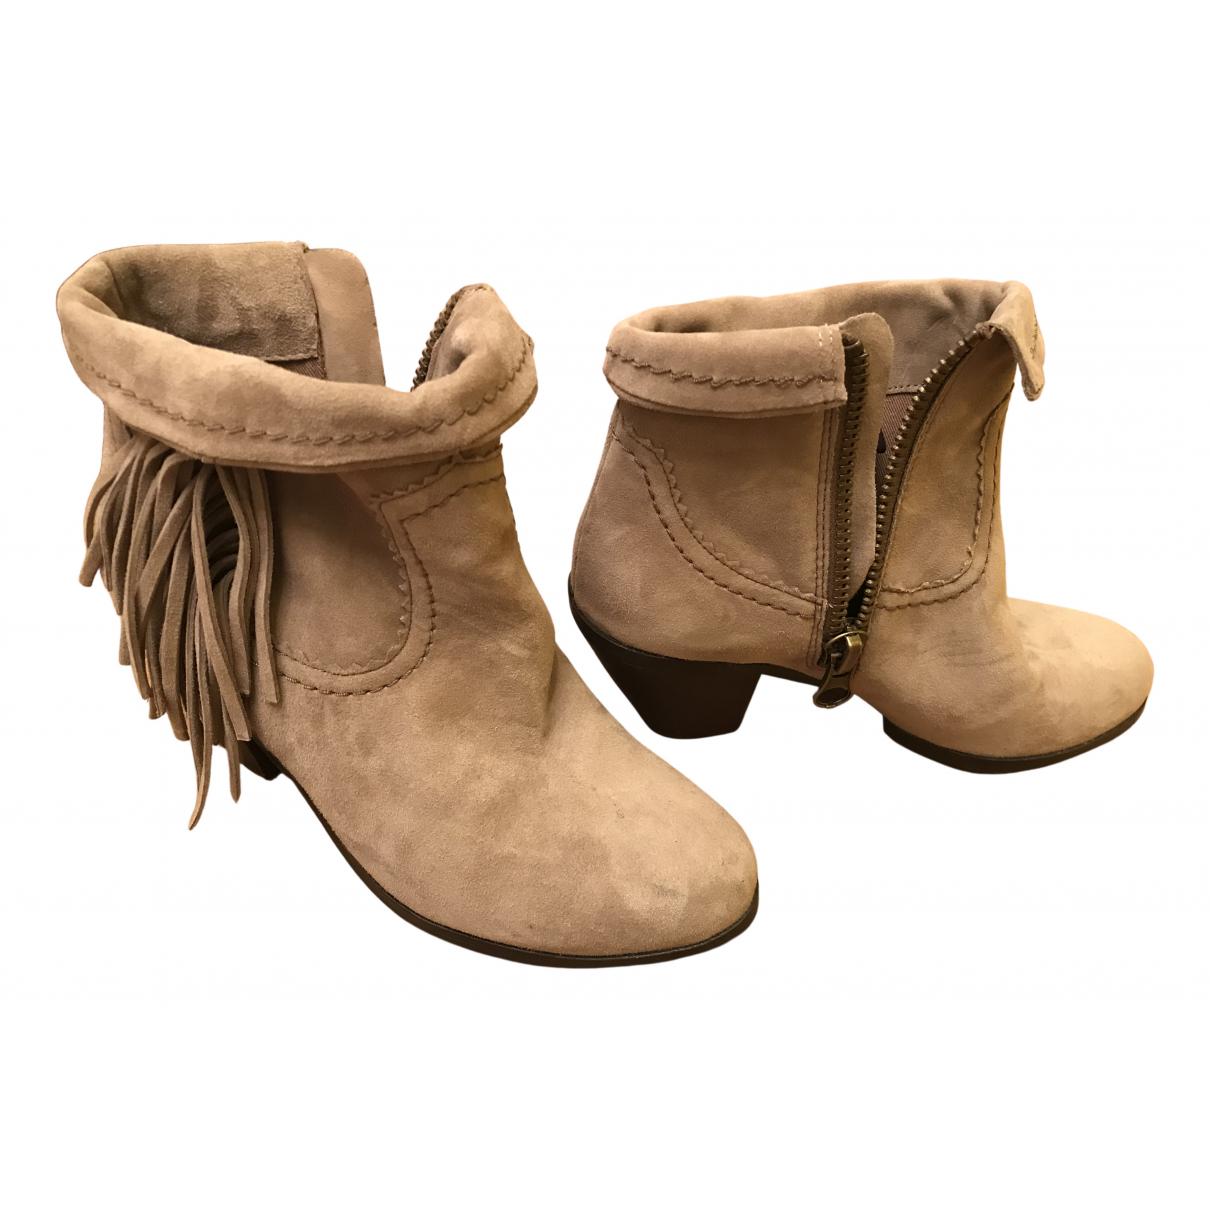 Sam Edelman N Grey Suede Ankle boots for Women 35 EU